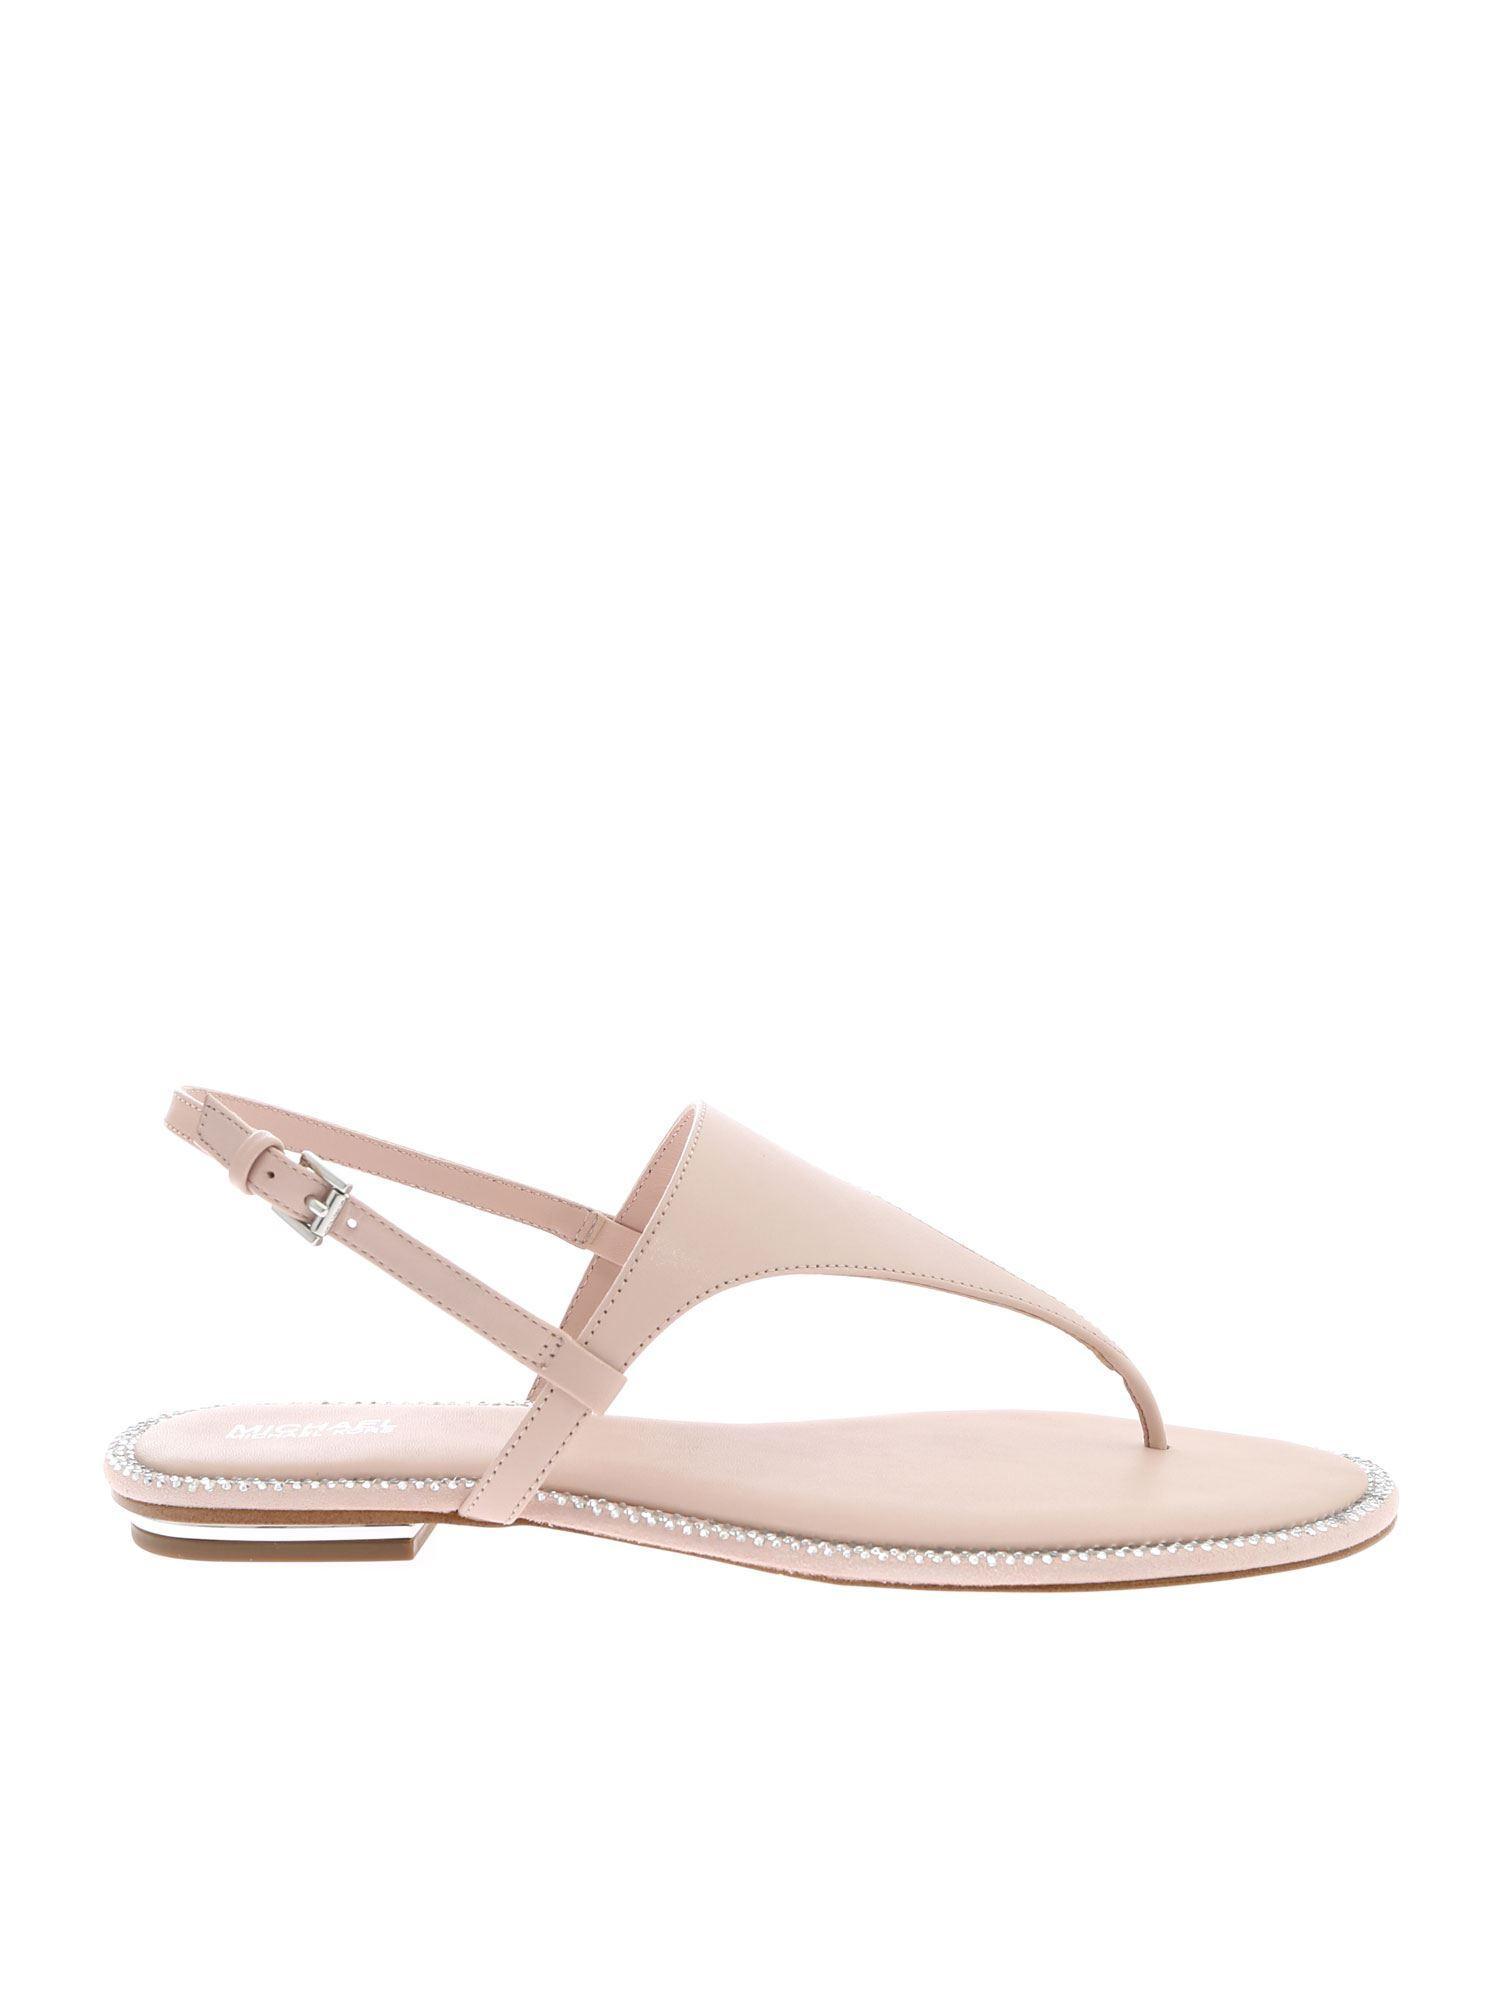 a99a4bb2b5fb Lyst - Michael Kors Michael Enid Thong Sandals in Pink